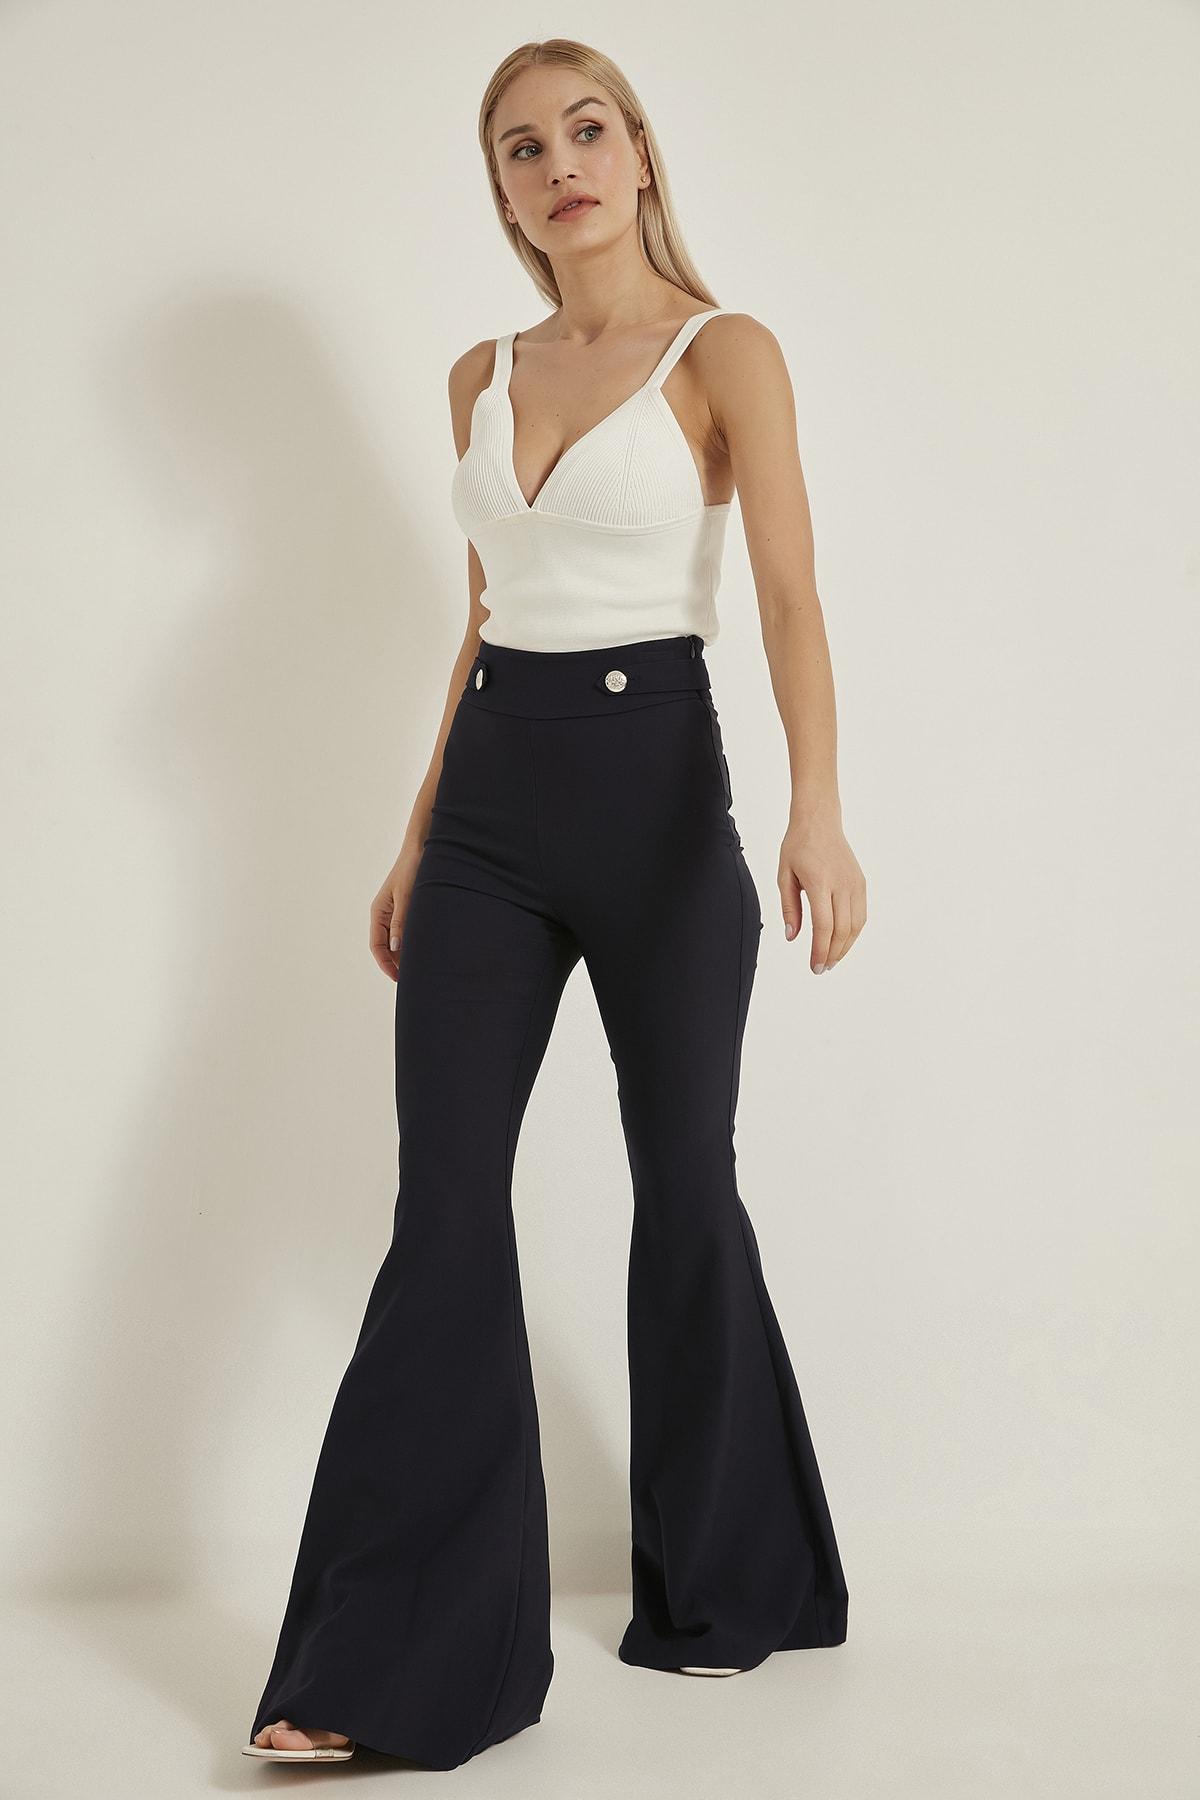 LA COSTUME Kadın Lacivert Ispanyol Paça Pantolon 1